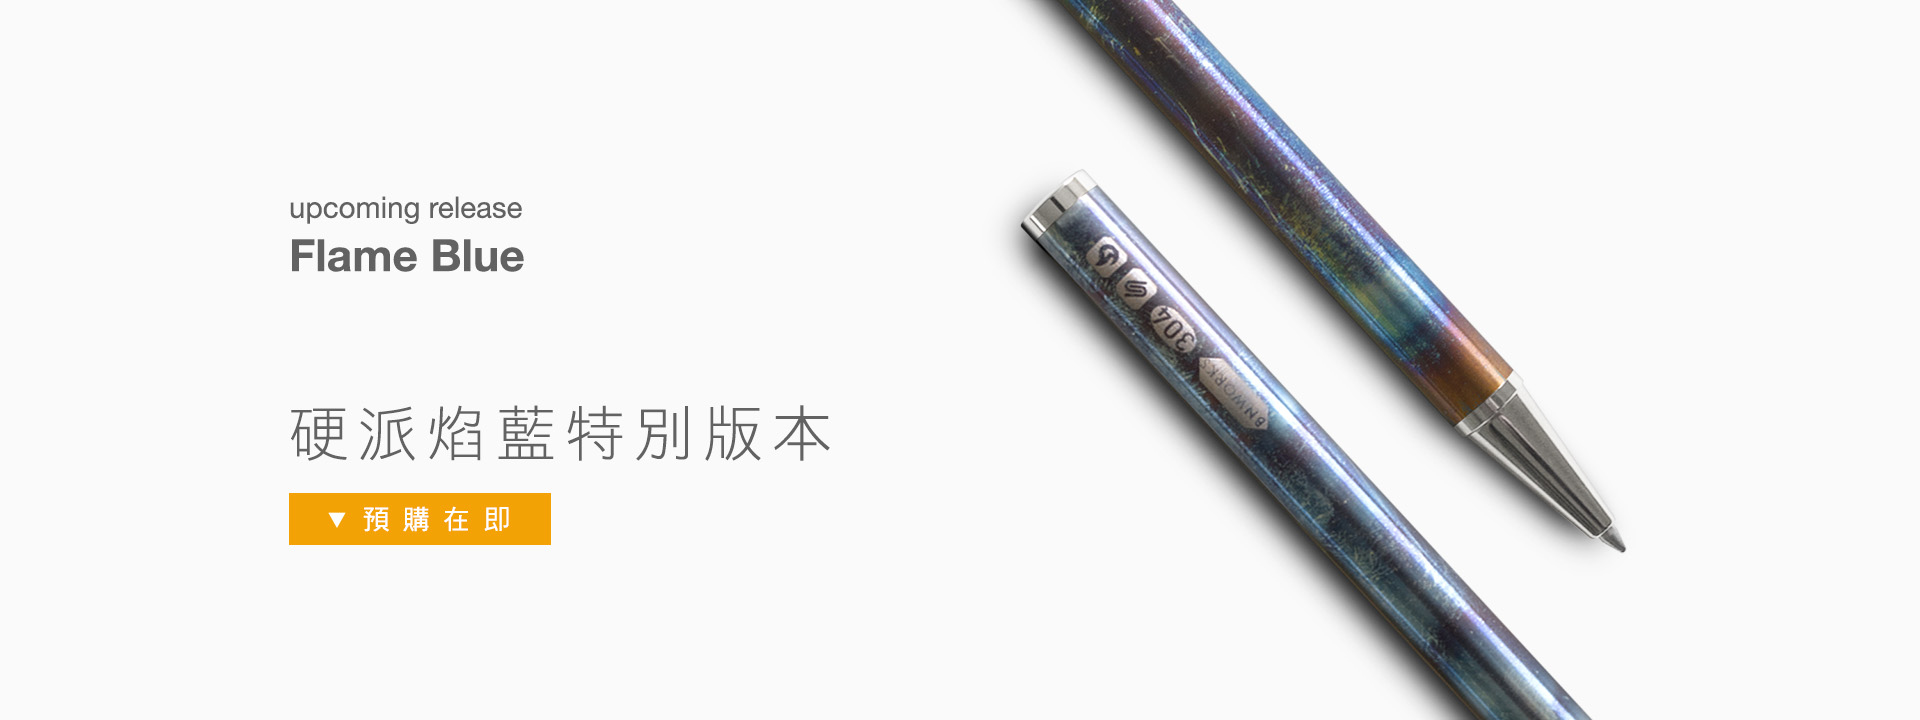 bnworks bndot 啟點系列 不銹鋼原子筆 硬派焰藍特別版本 燒色 熱著色